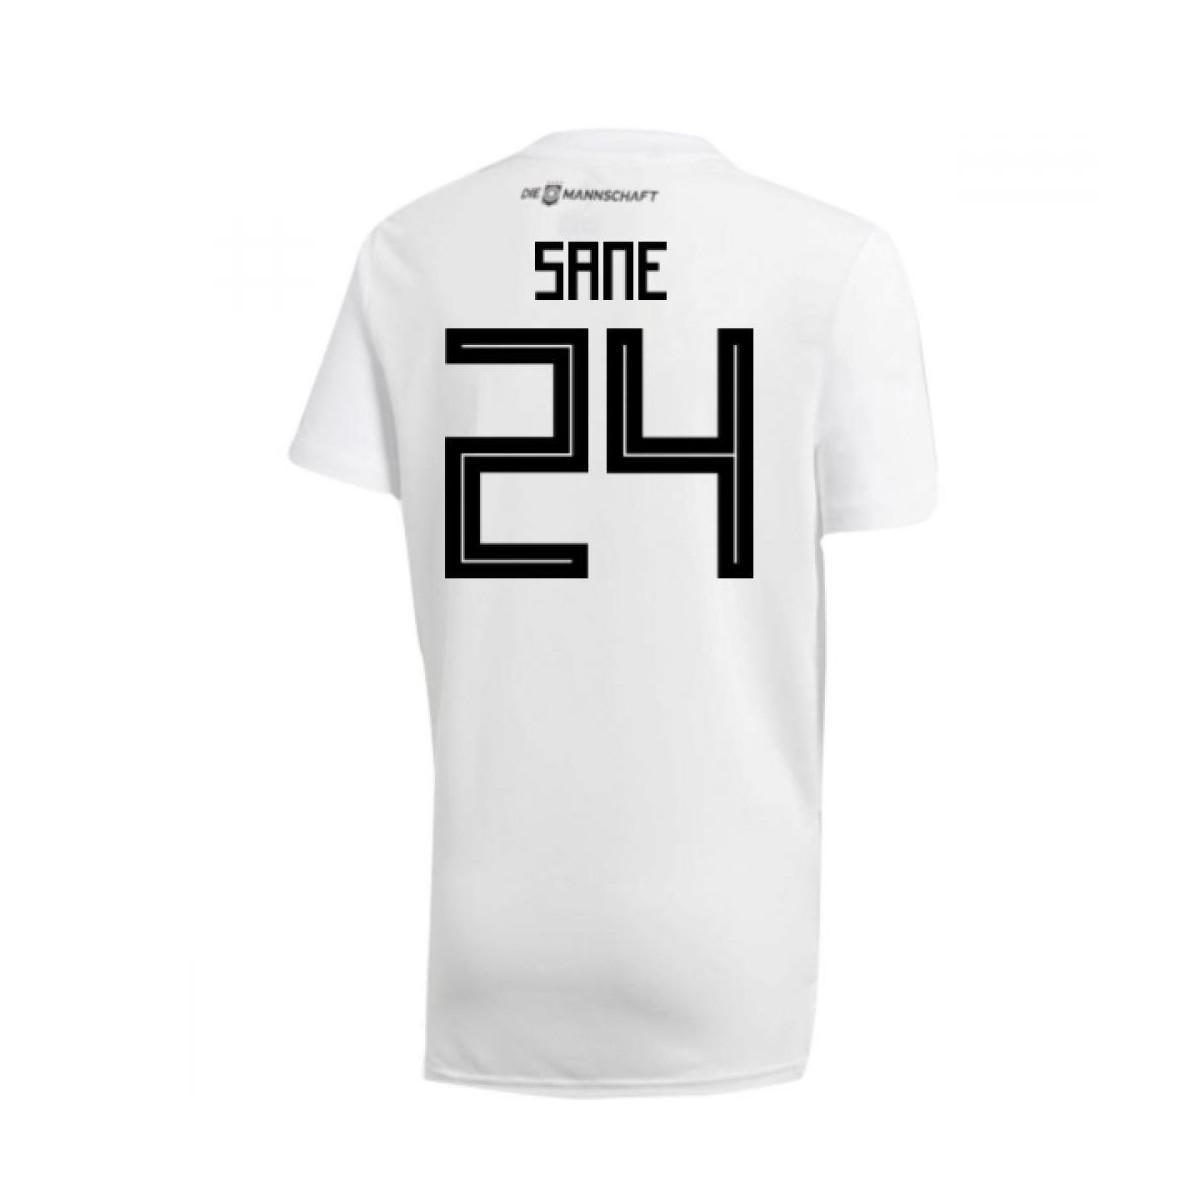 d9c16312a adidas 2018-19 Germany Home Training Shirt (sane 24) Men s T Shirt ...